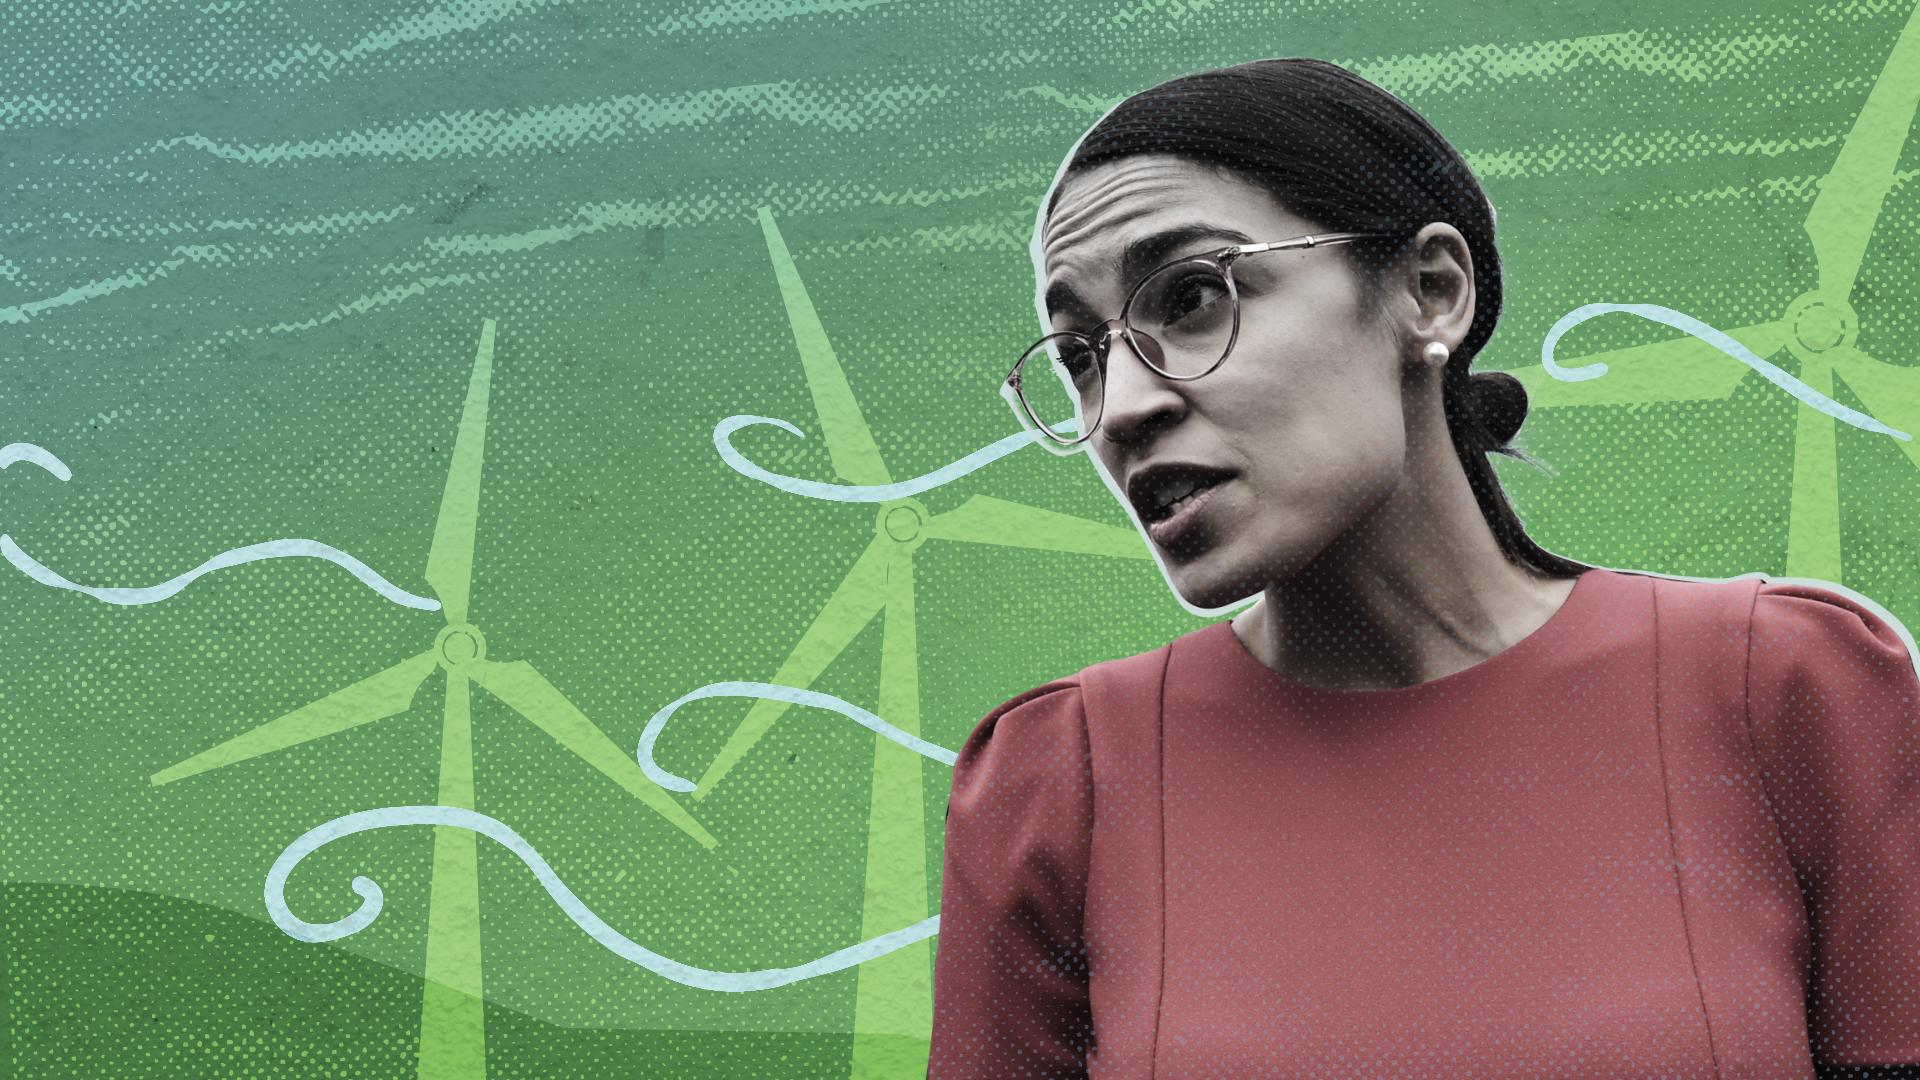 Centrist Democrats push back against party's liberal surge